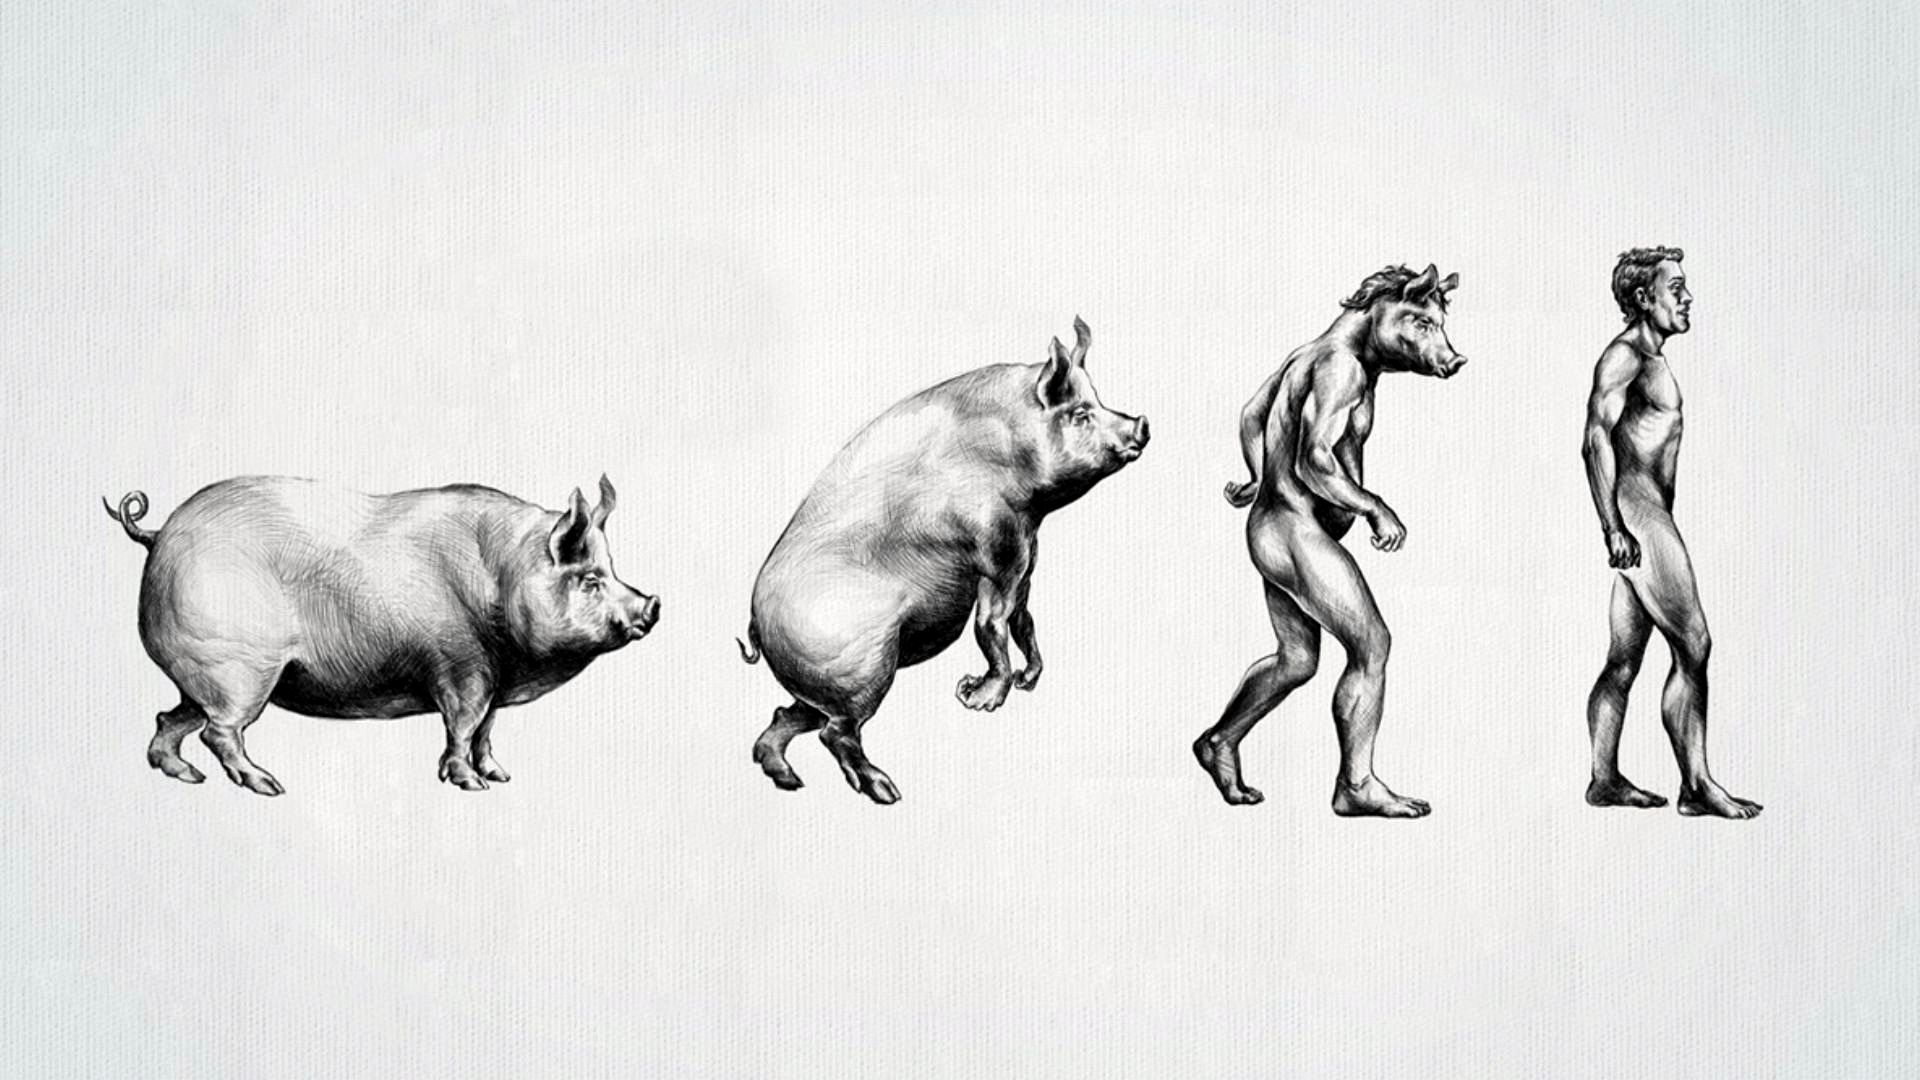 http://khongthe.com/wallpapers/abstract/evolution-of-pig-man-218349.jpg